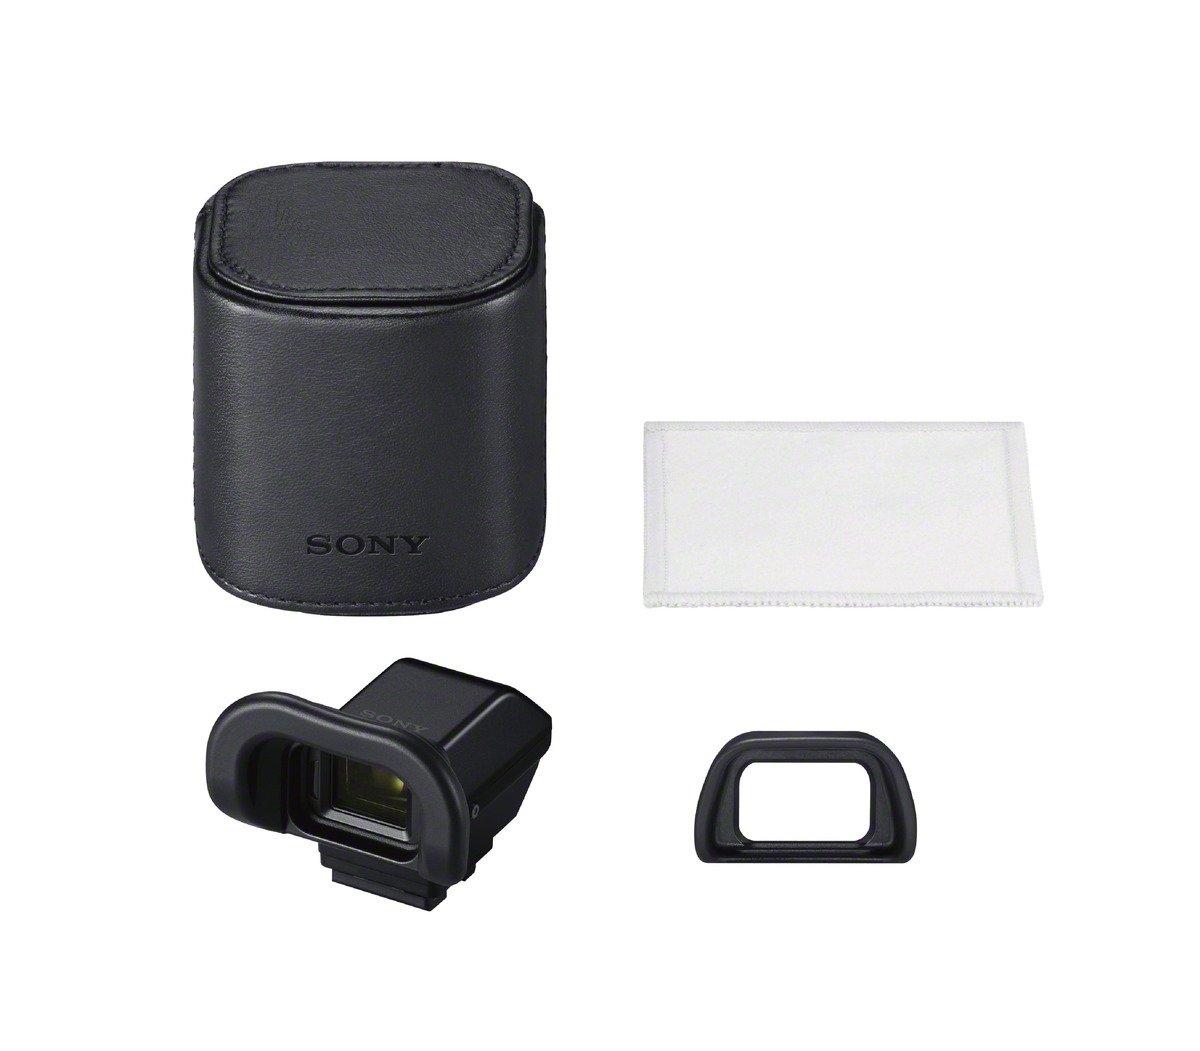 Sony FDAEV1MK Electronic Viewfinder Kit (Black) by Sony